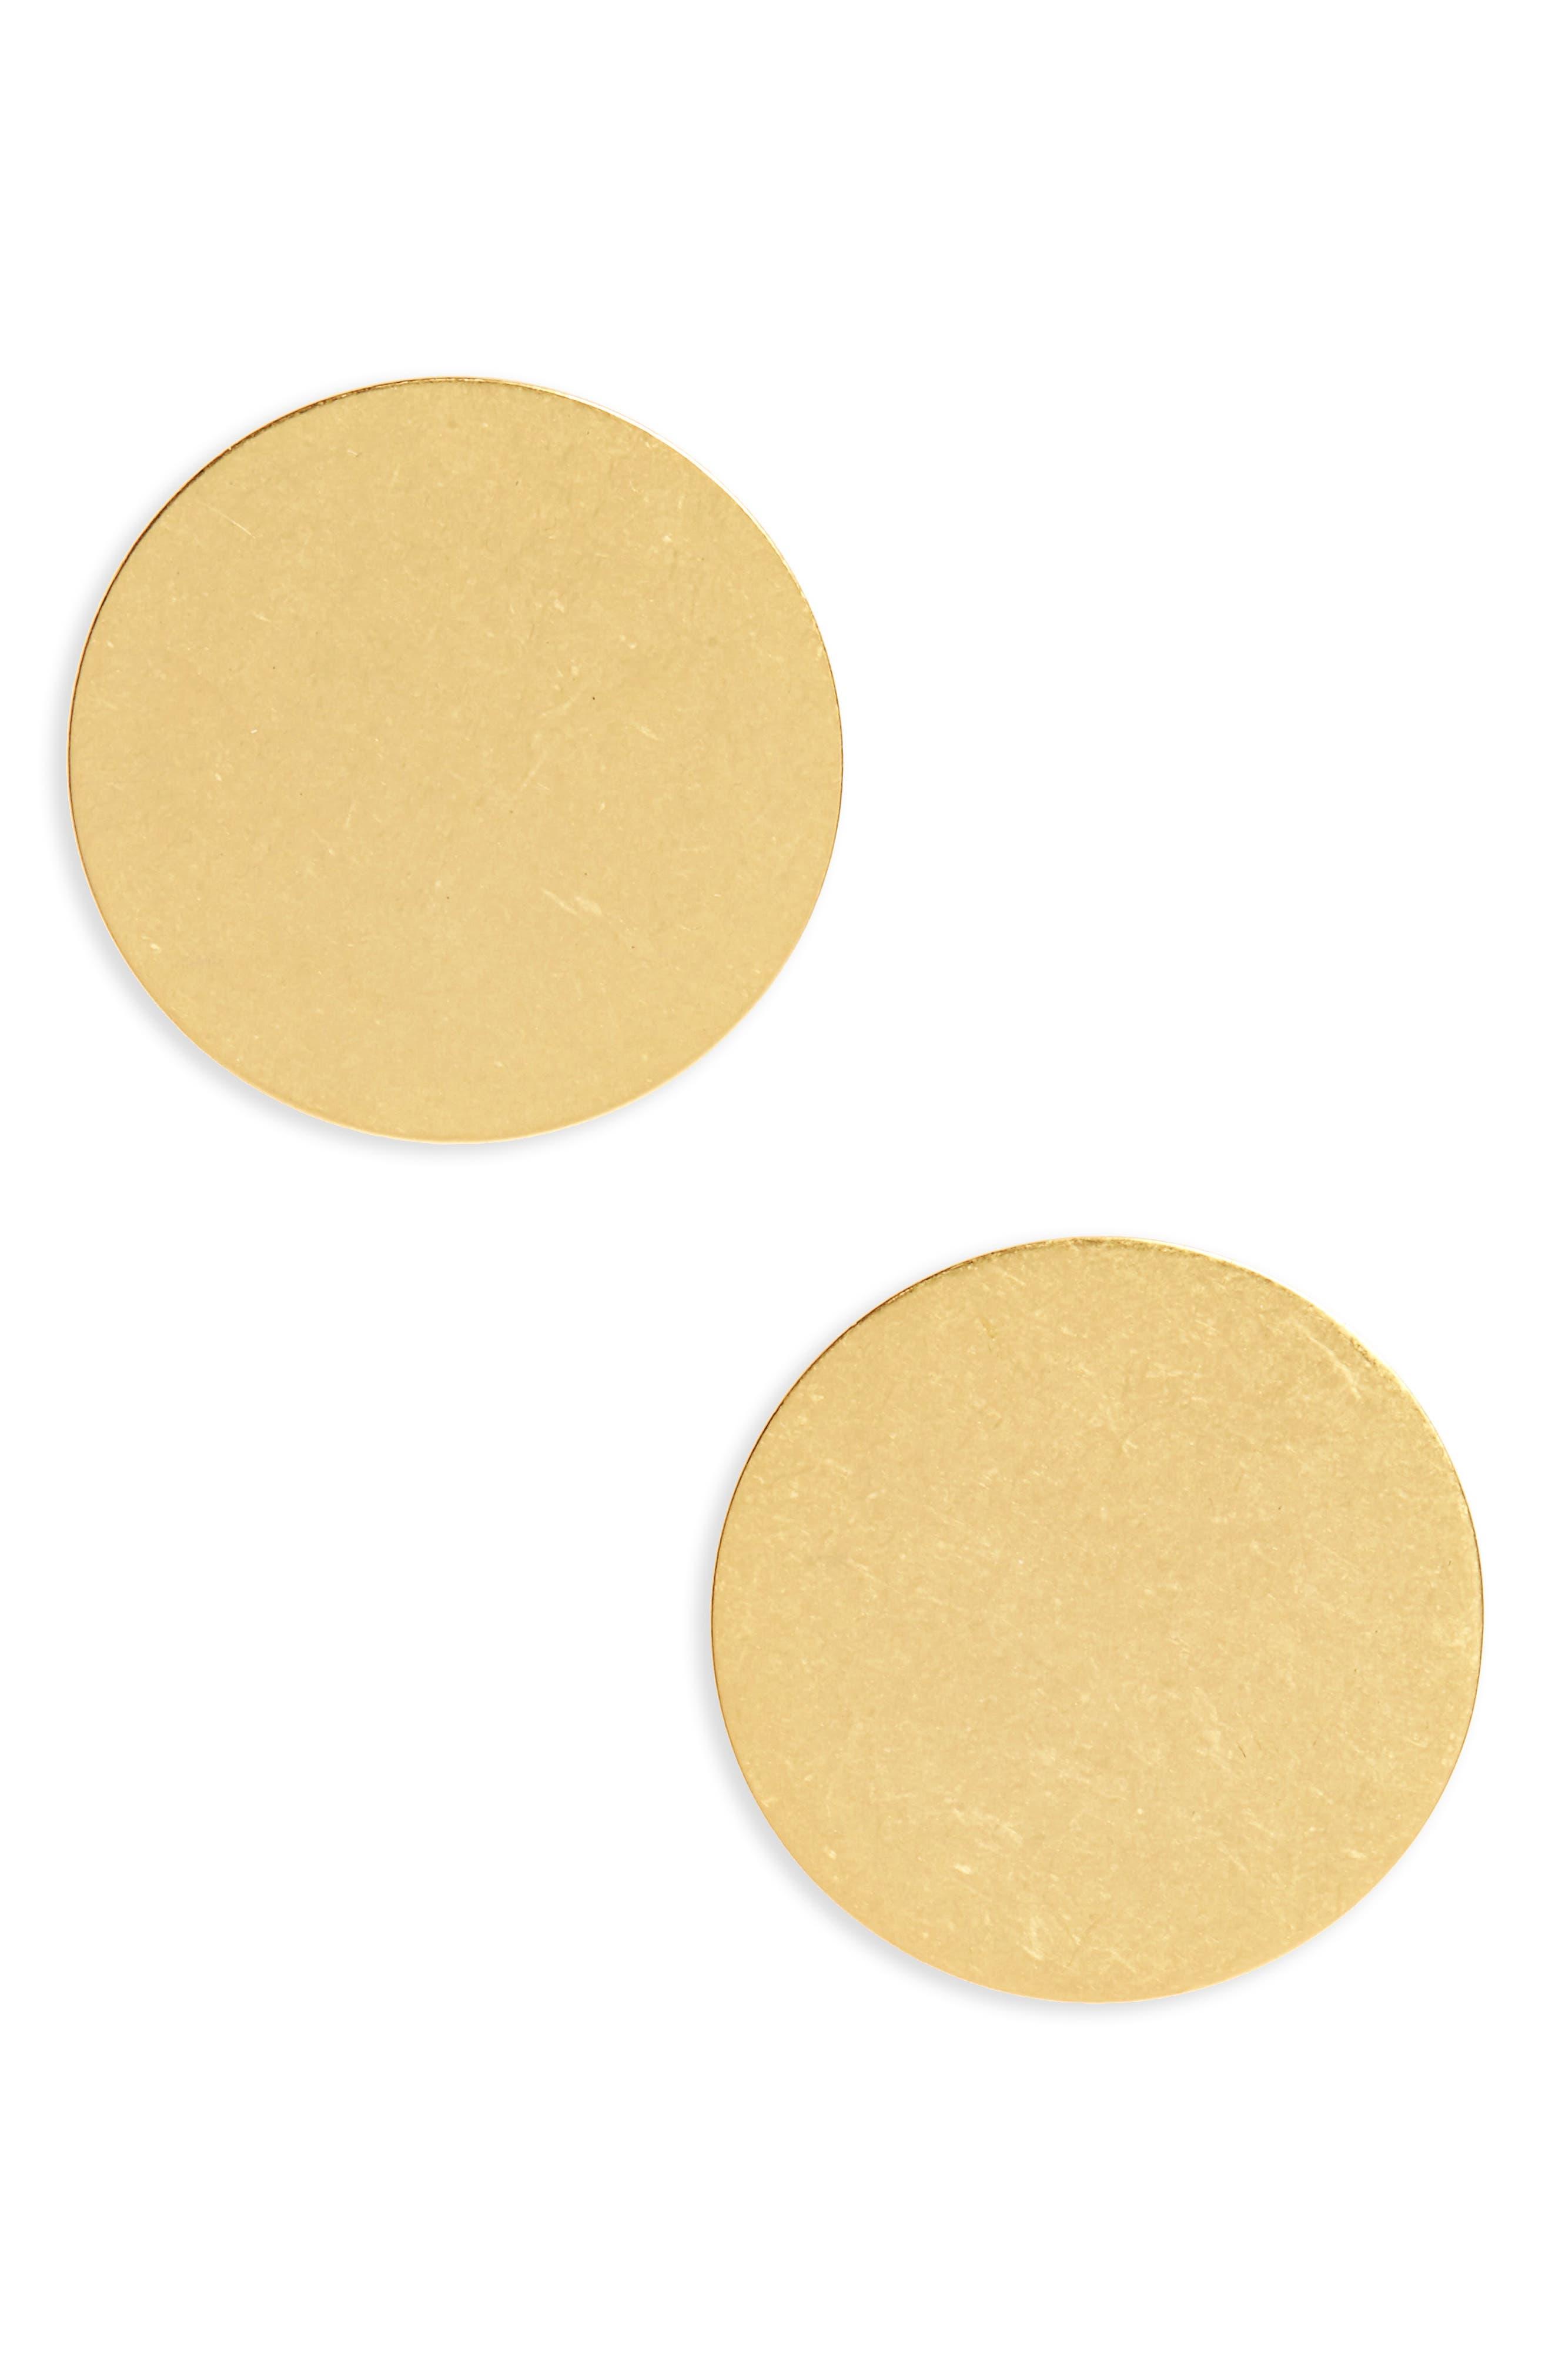 Circle Stud Earrings,                             Main thumbnail 1, color,                             710